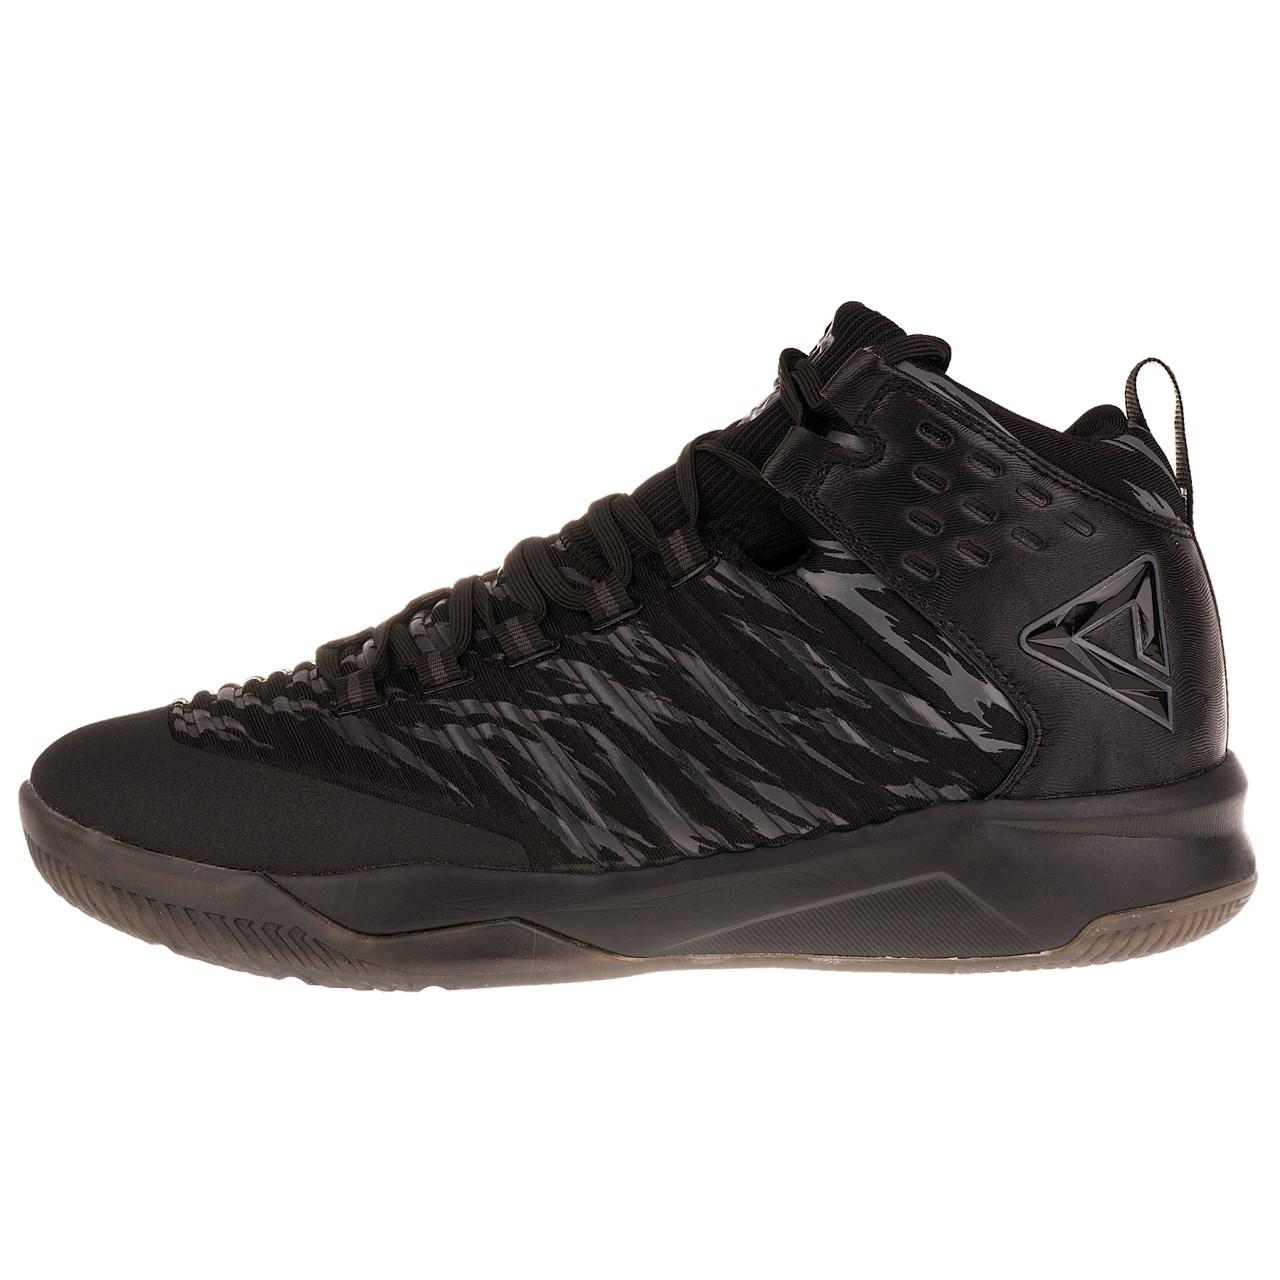 قیمت کفش بسکتبال مردانه پیک مدل E73121A